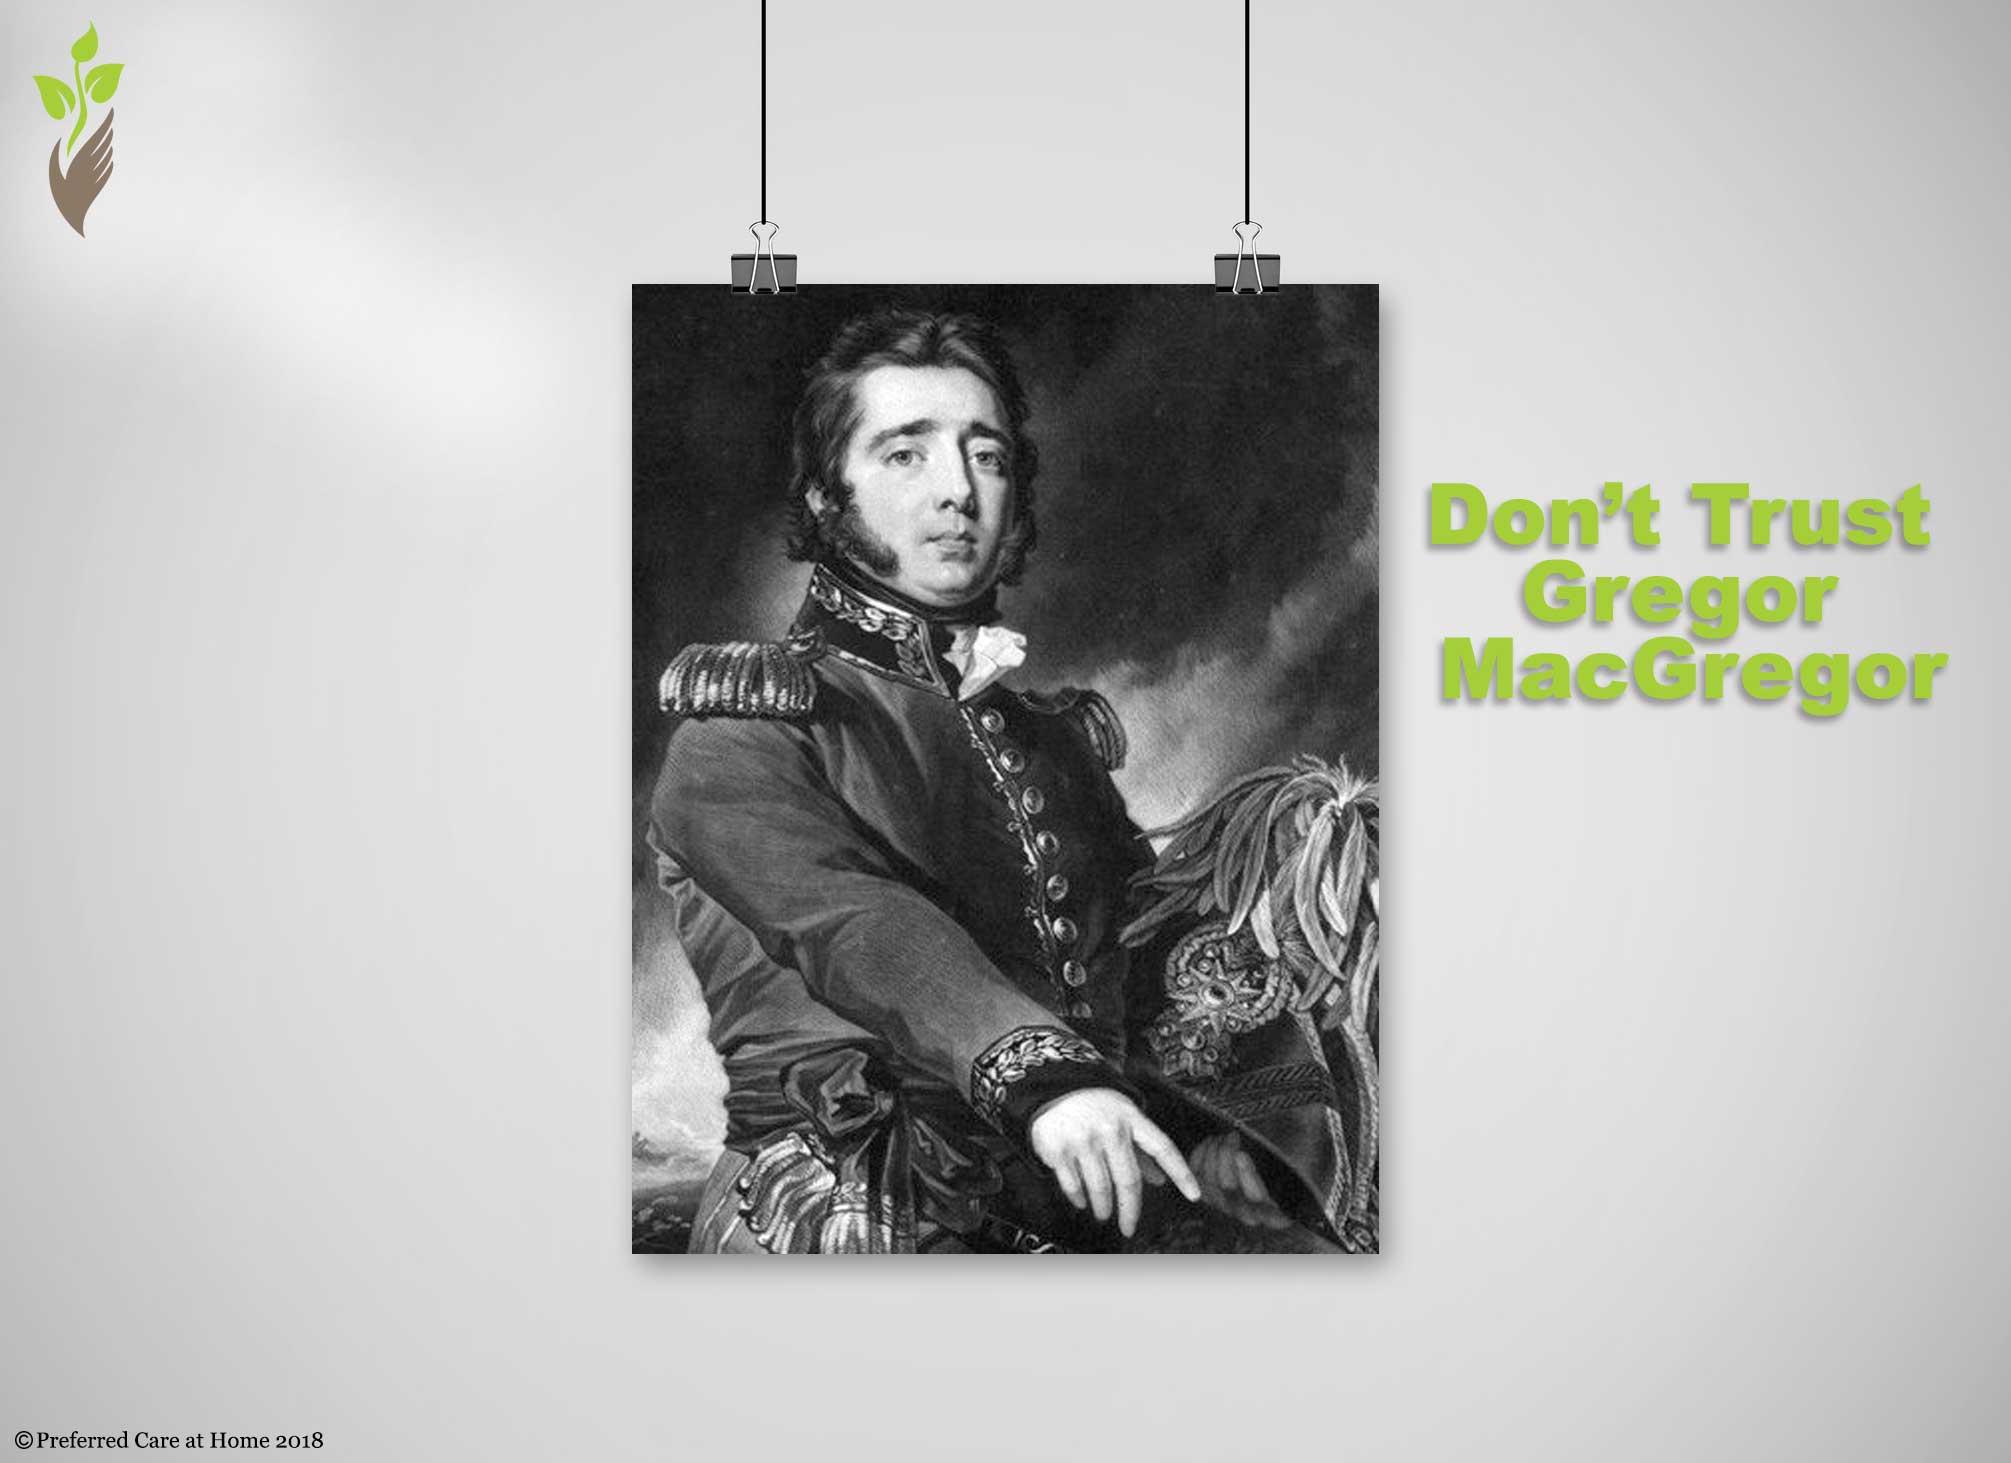 Gregor MacGregor's confidence trick